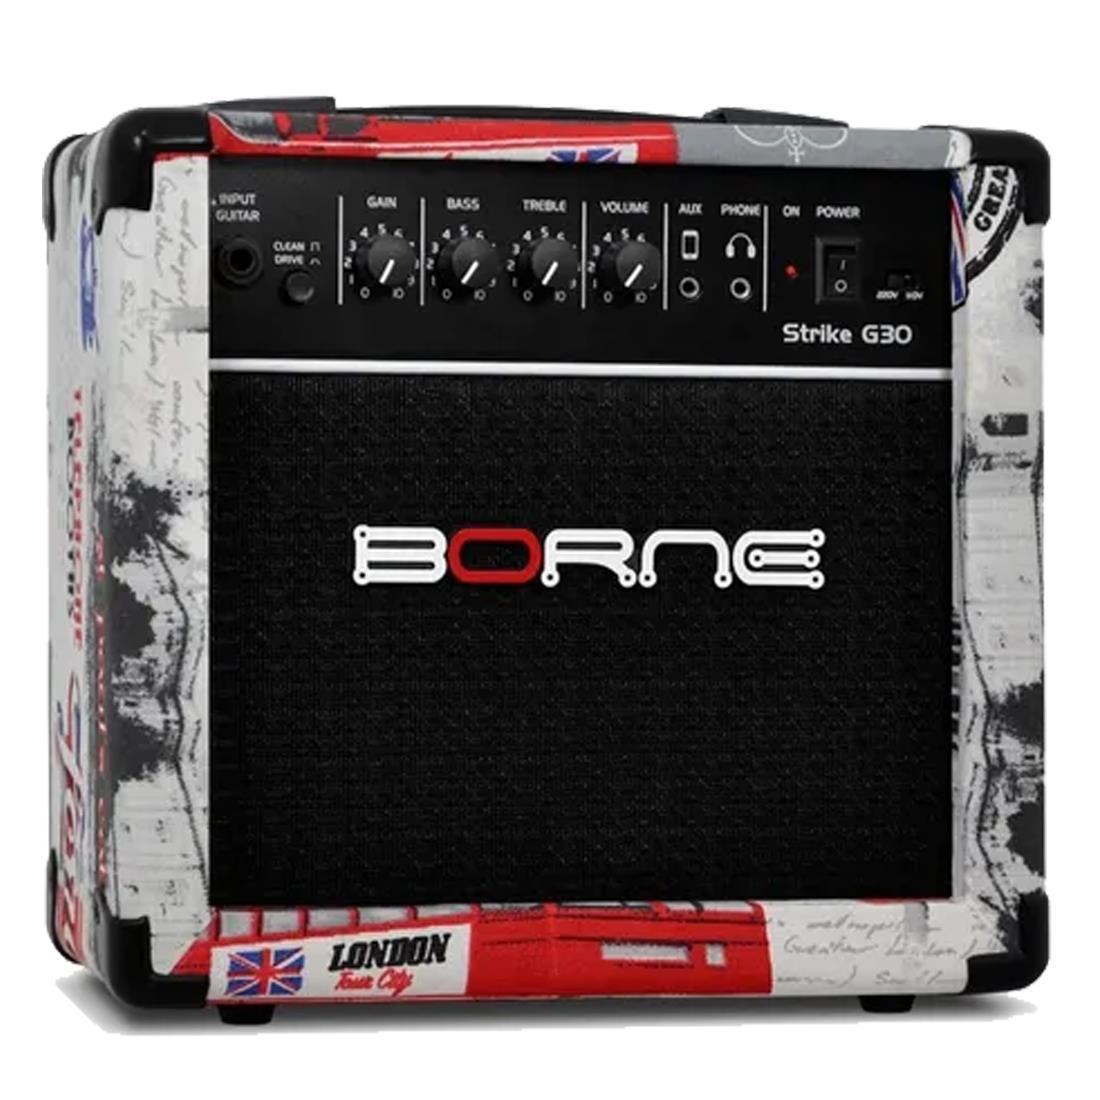 Borne Amplificador Cubo para Guitarra STRIKE G30 London (6''/15w RMS)